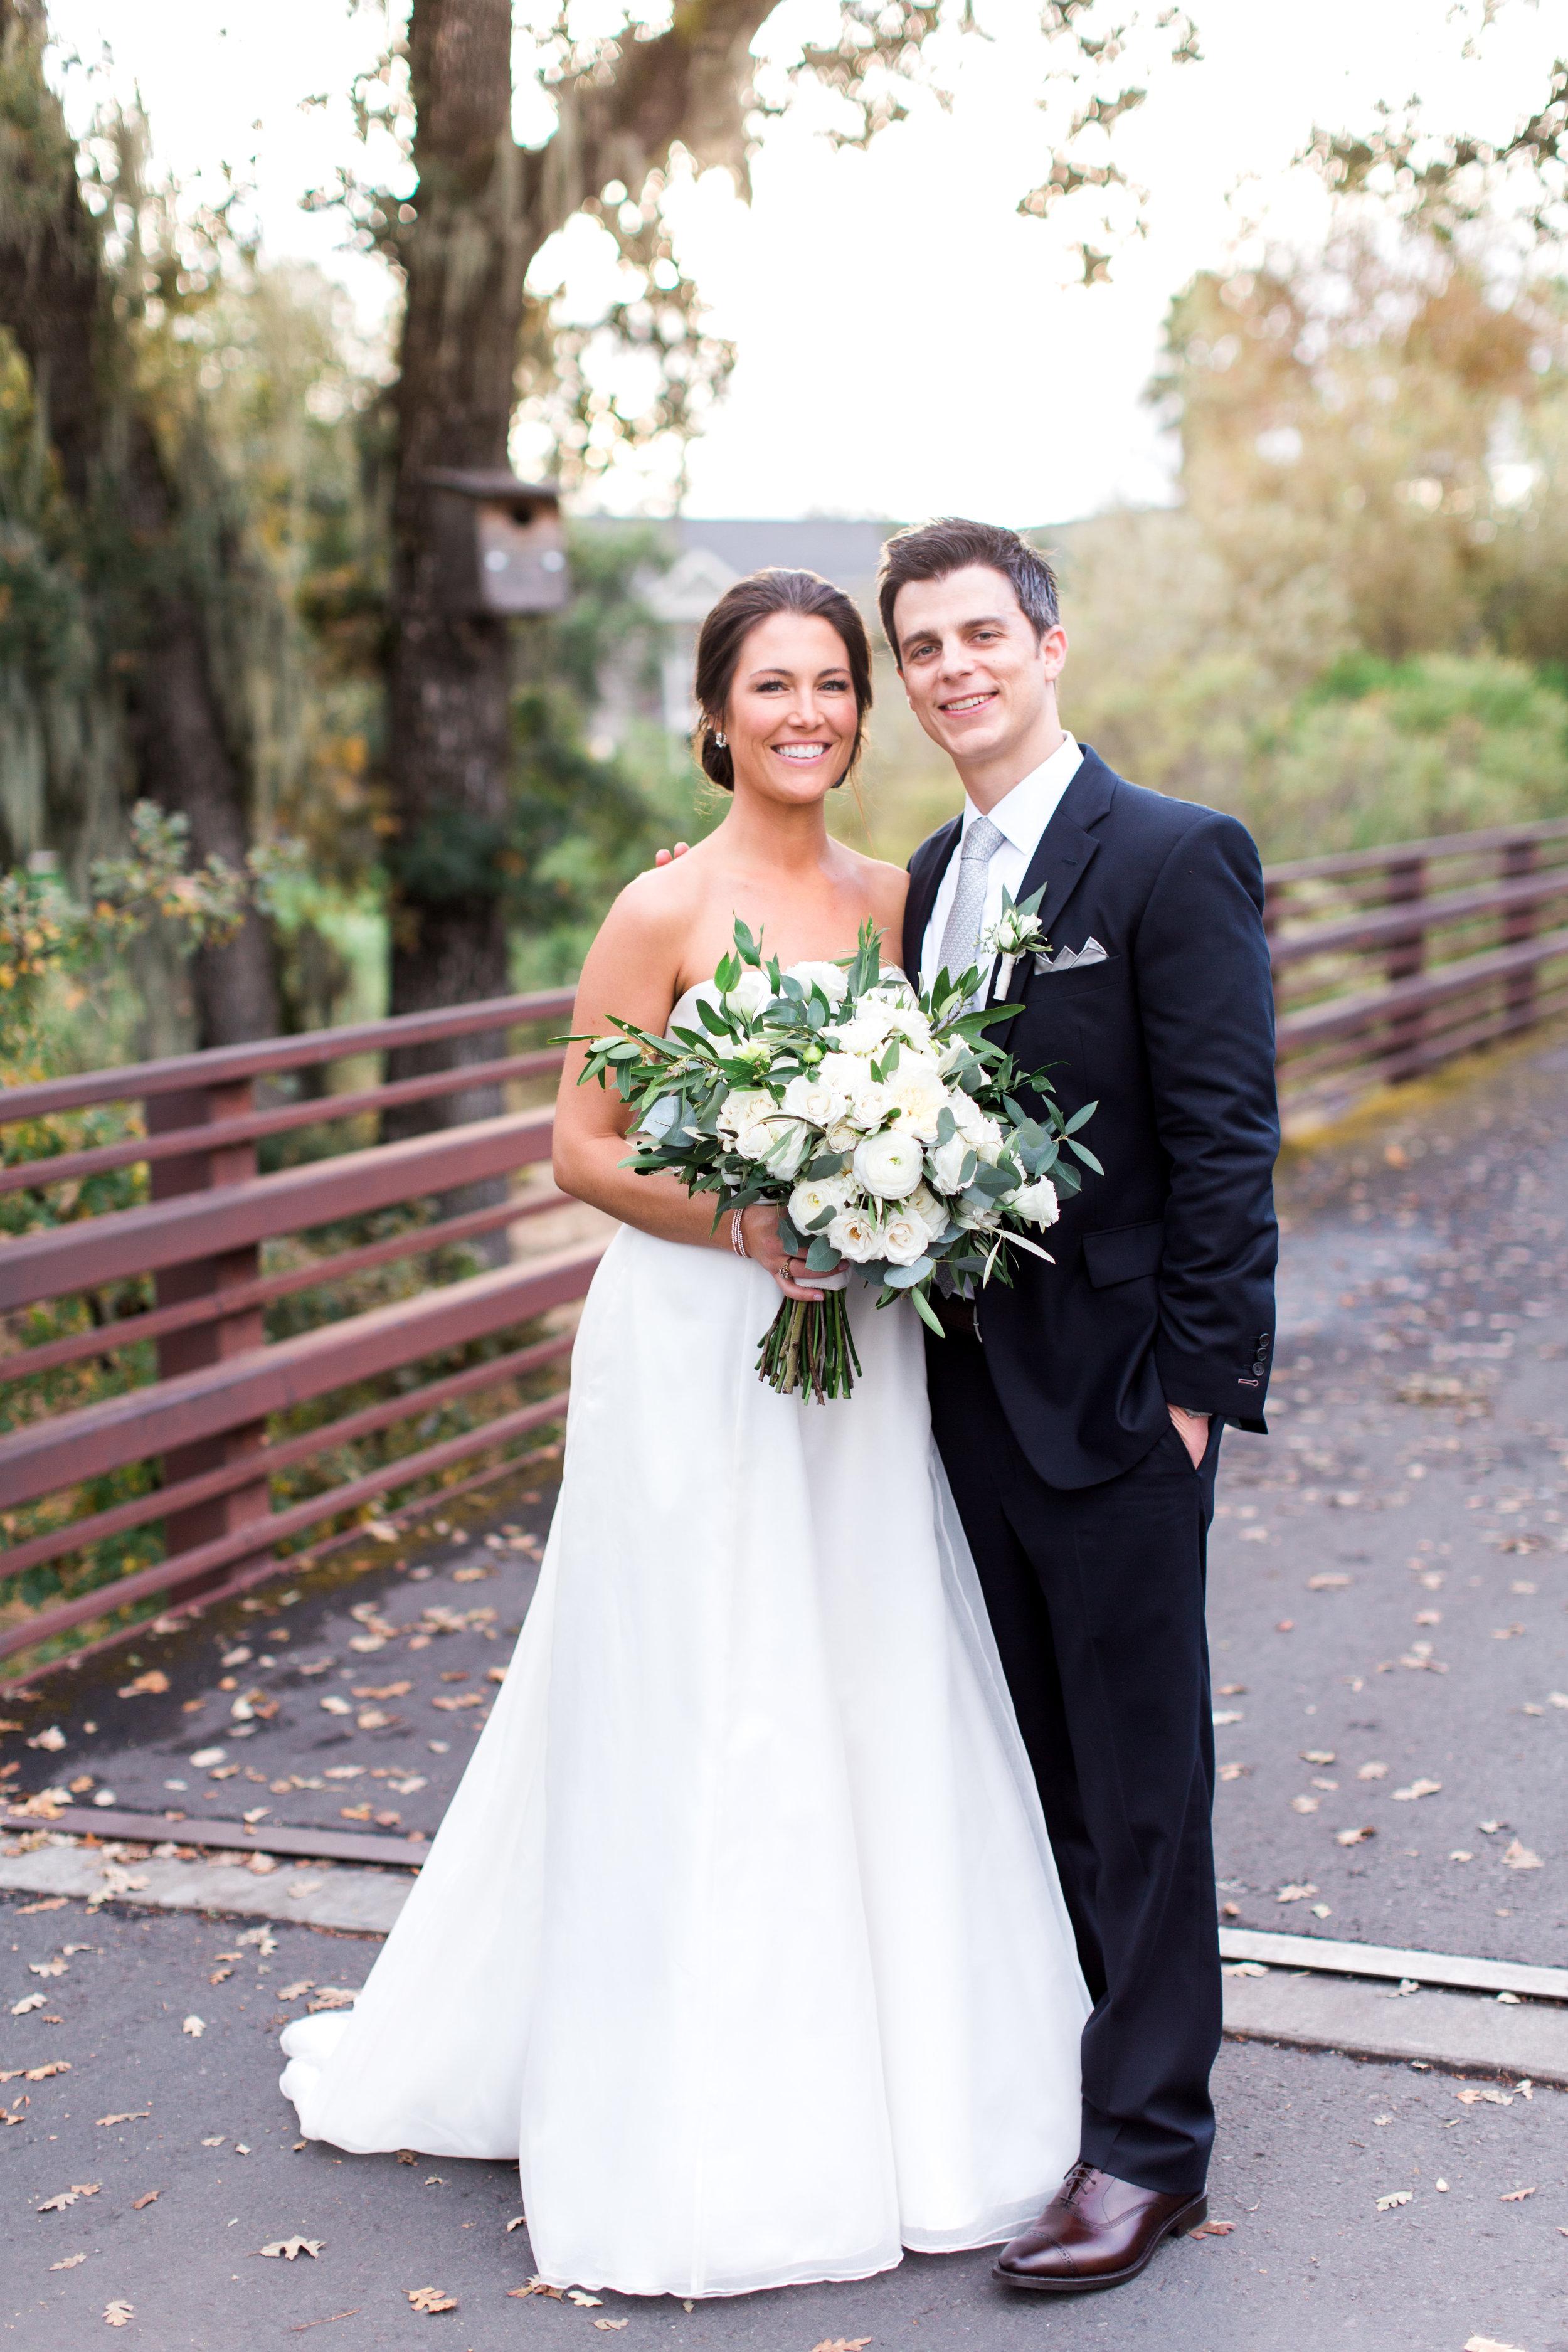 intimate-wedding-at-solage-calistoga-in-napa-82.jpg